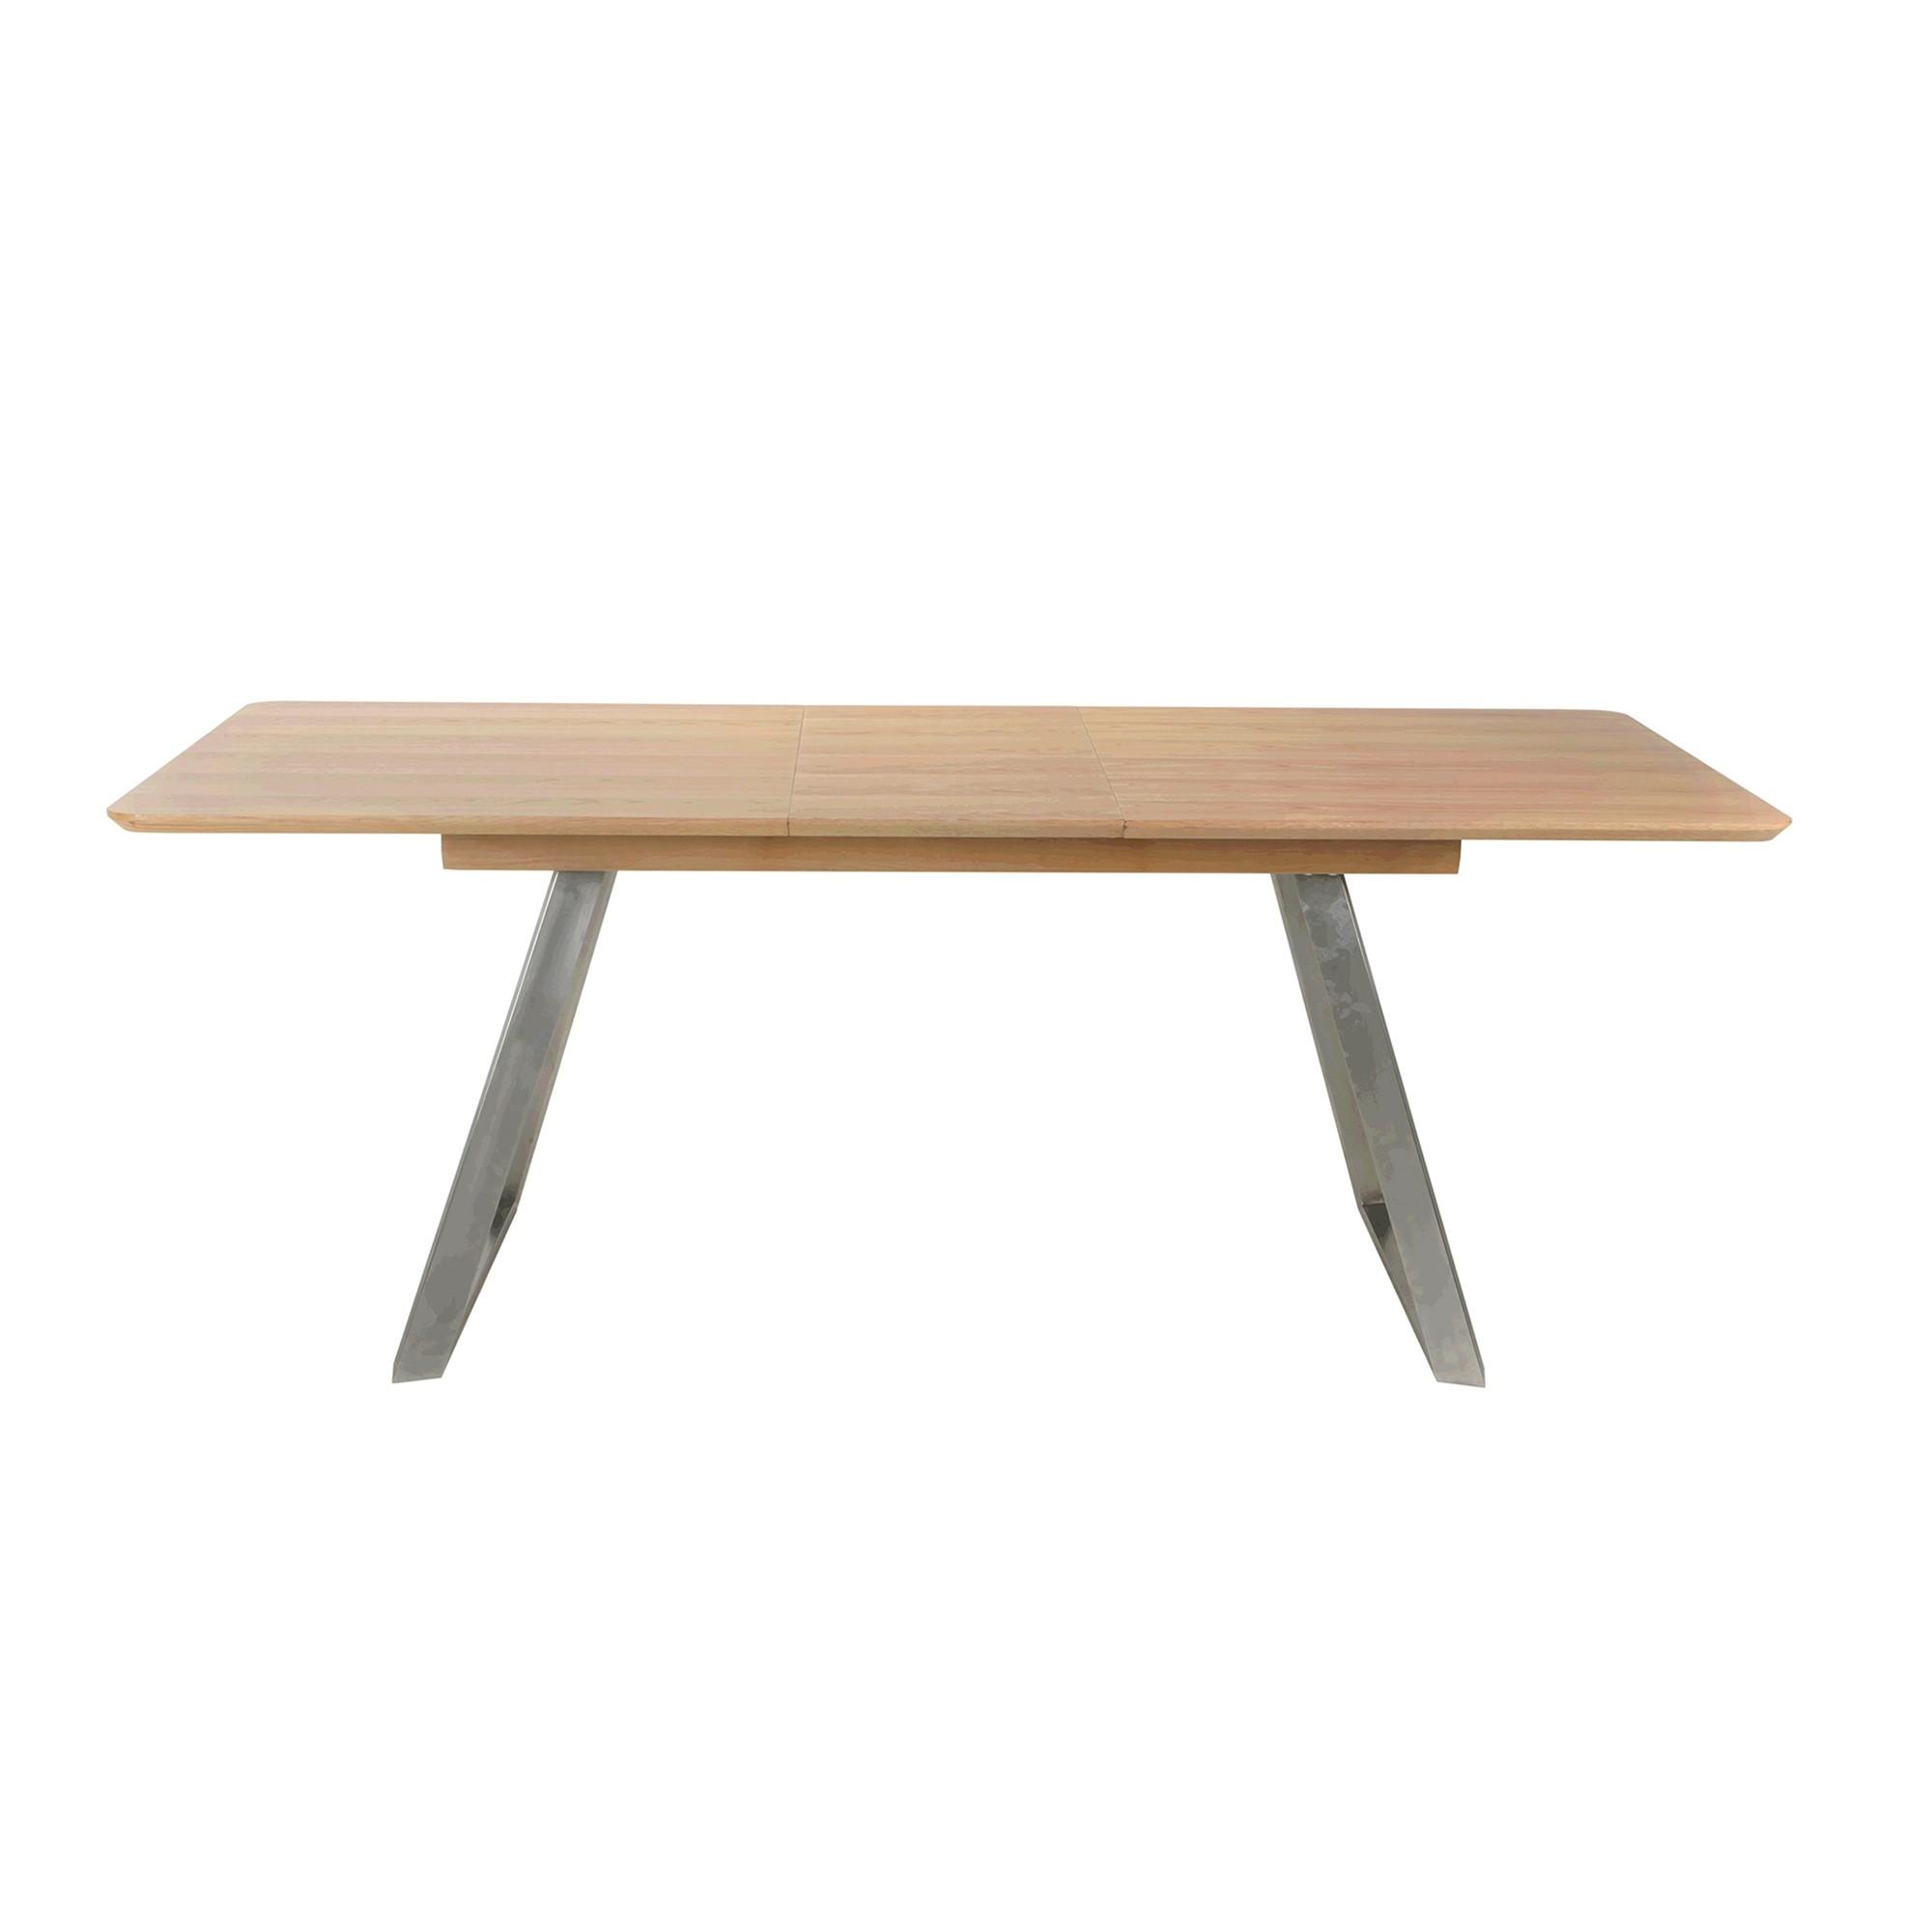 Odin Extension Dining Table, 160-200cm, Oak